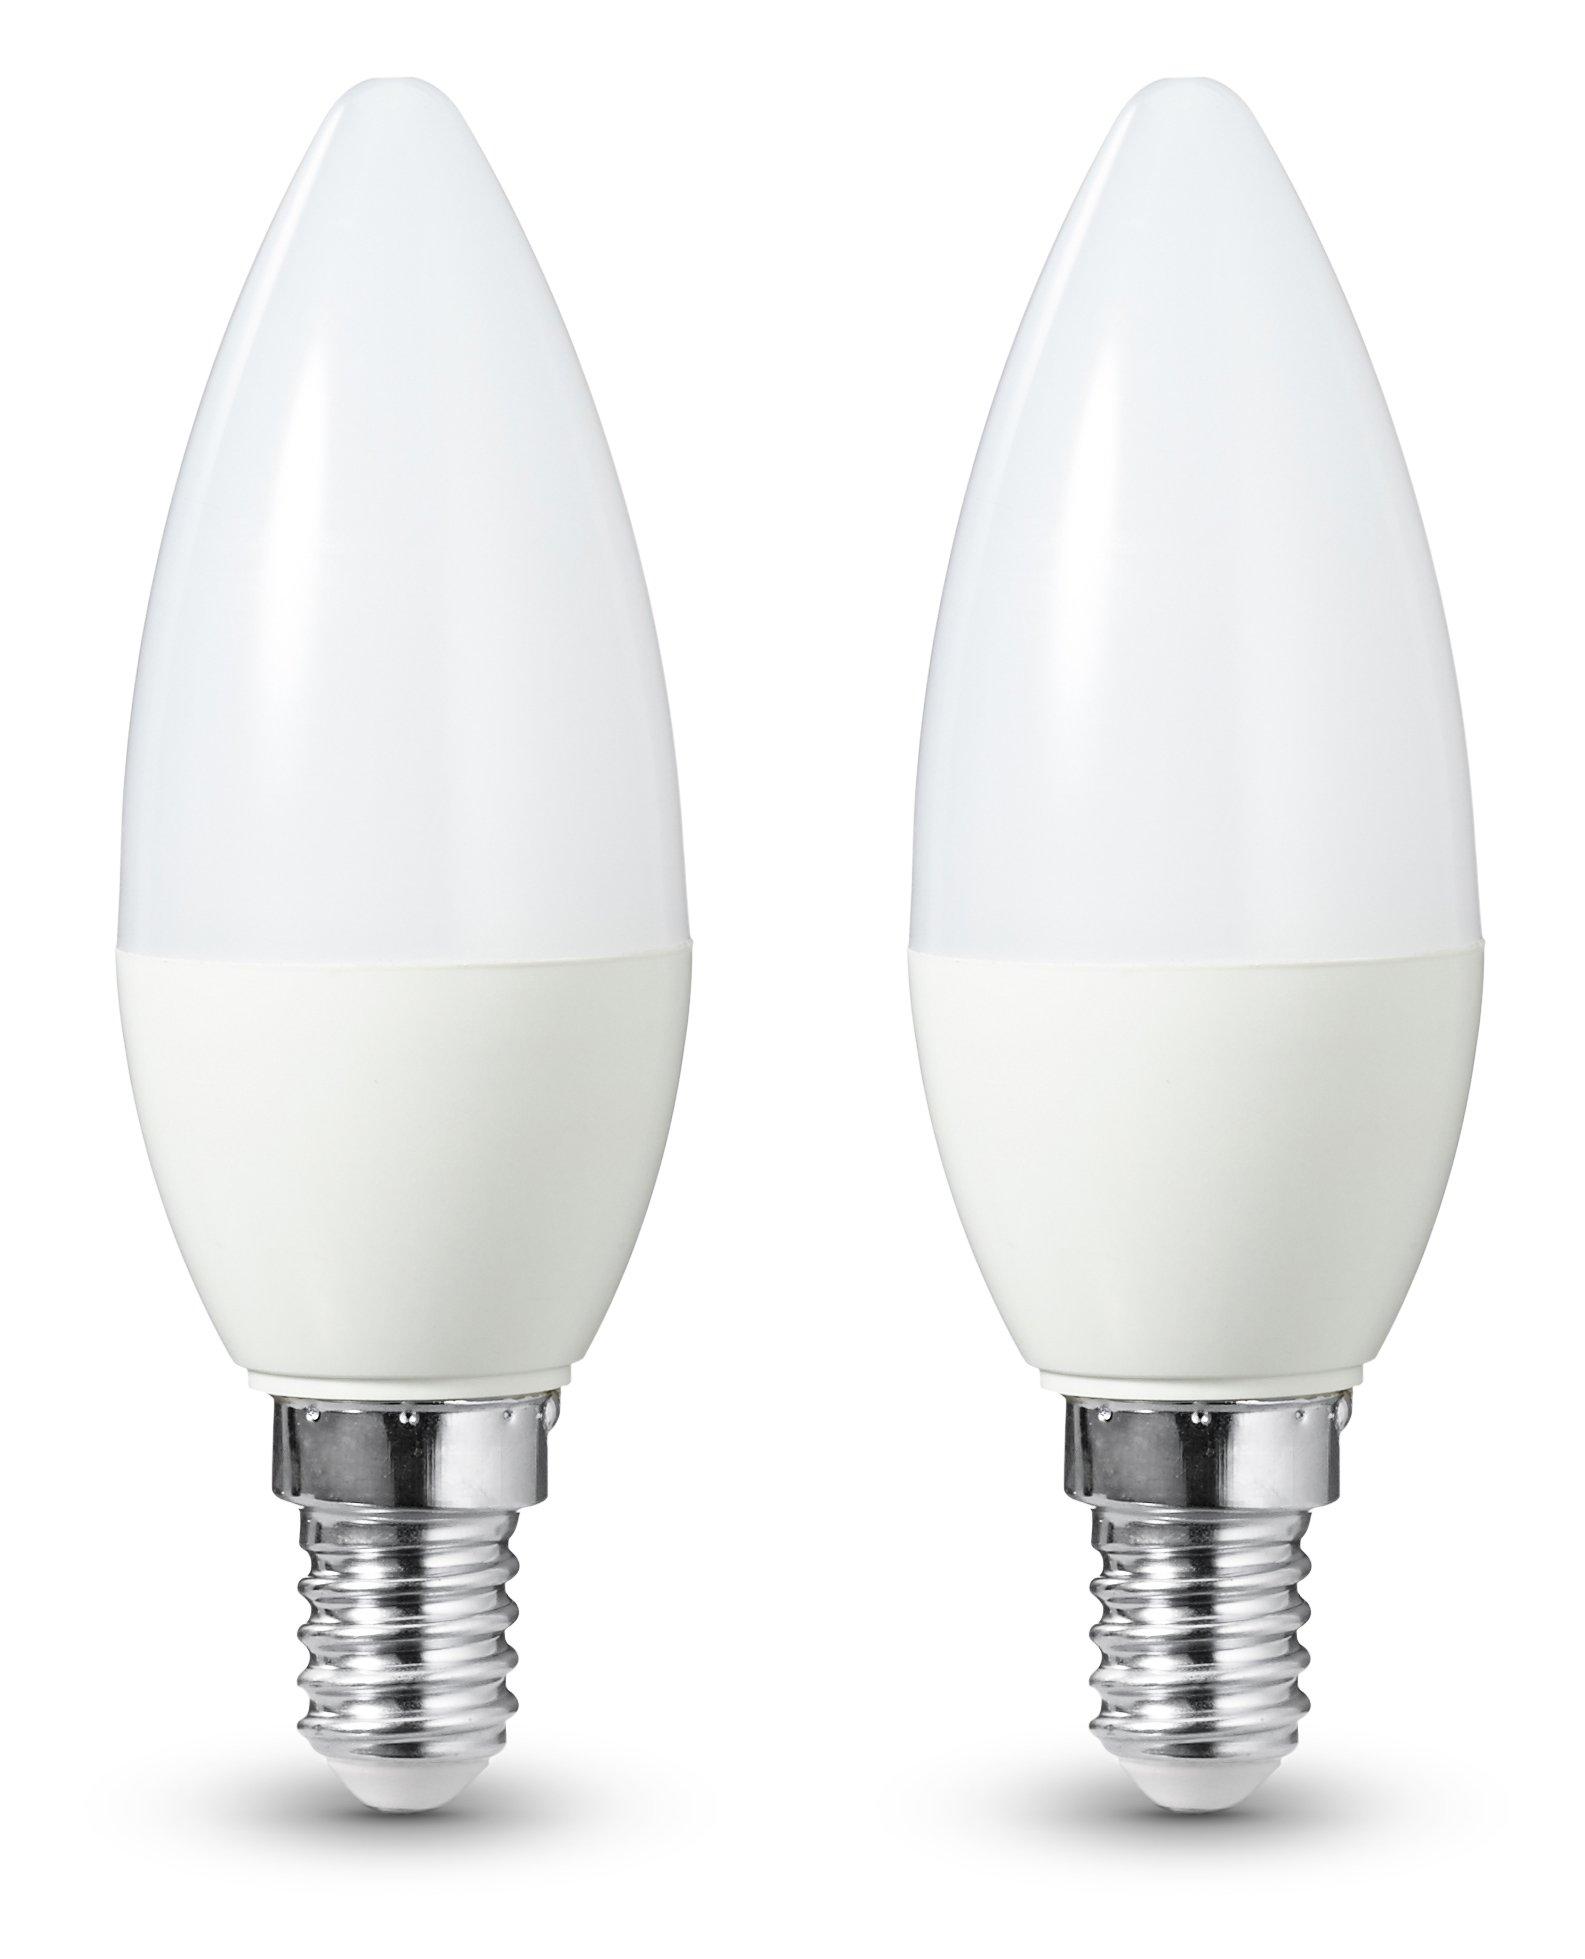 AmazonBasics - Bombilla LED E14, 5,5 W equivalente a 40 W, 470